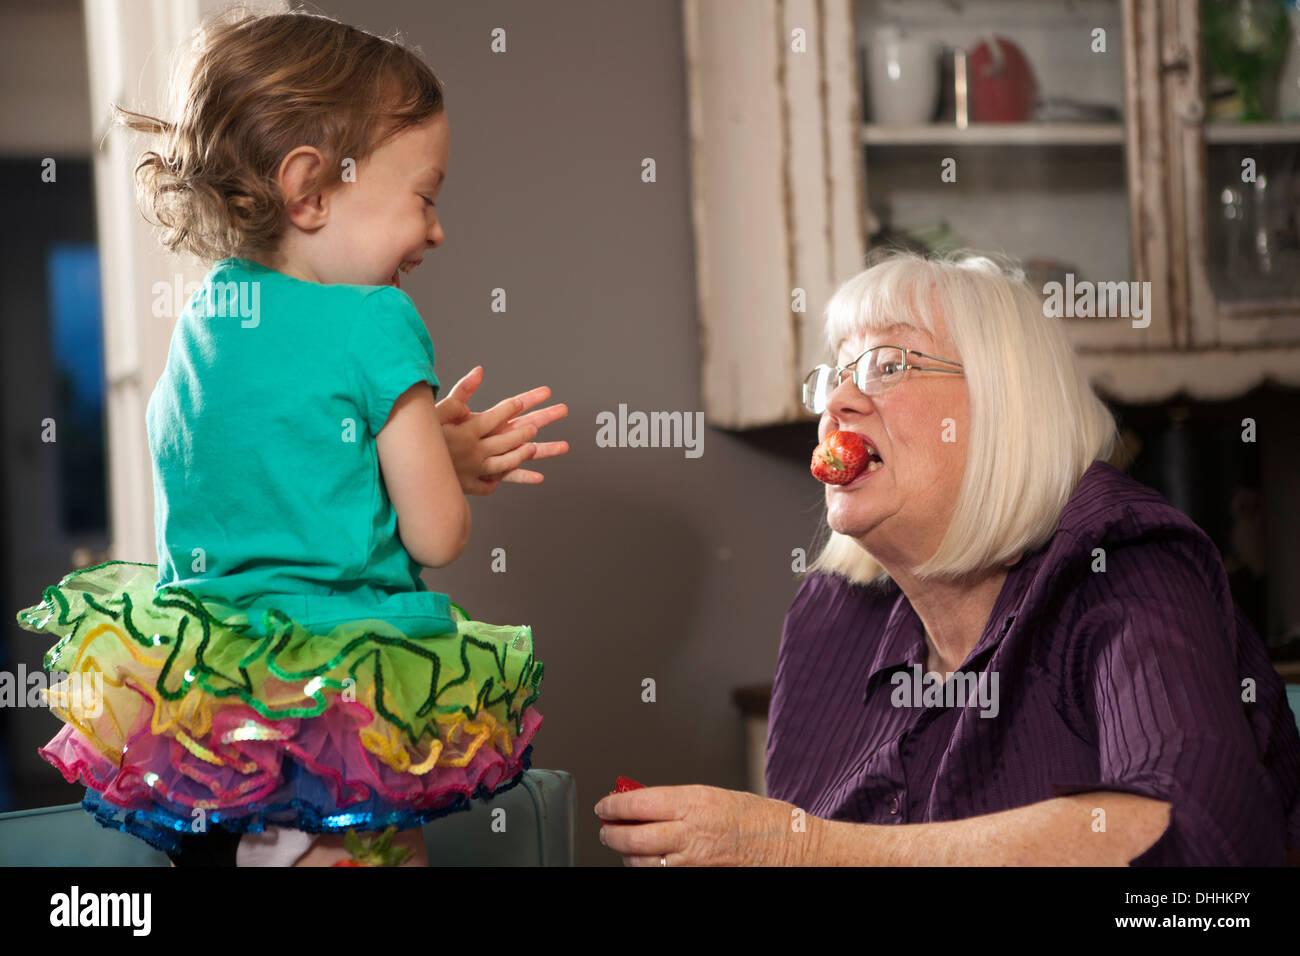 Abuela Chica alimentando una fresa Imagen De Stock